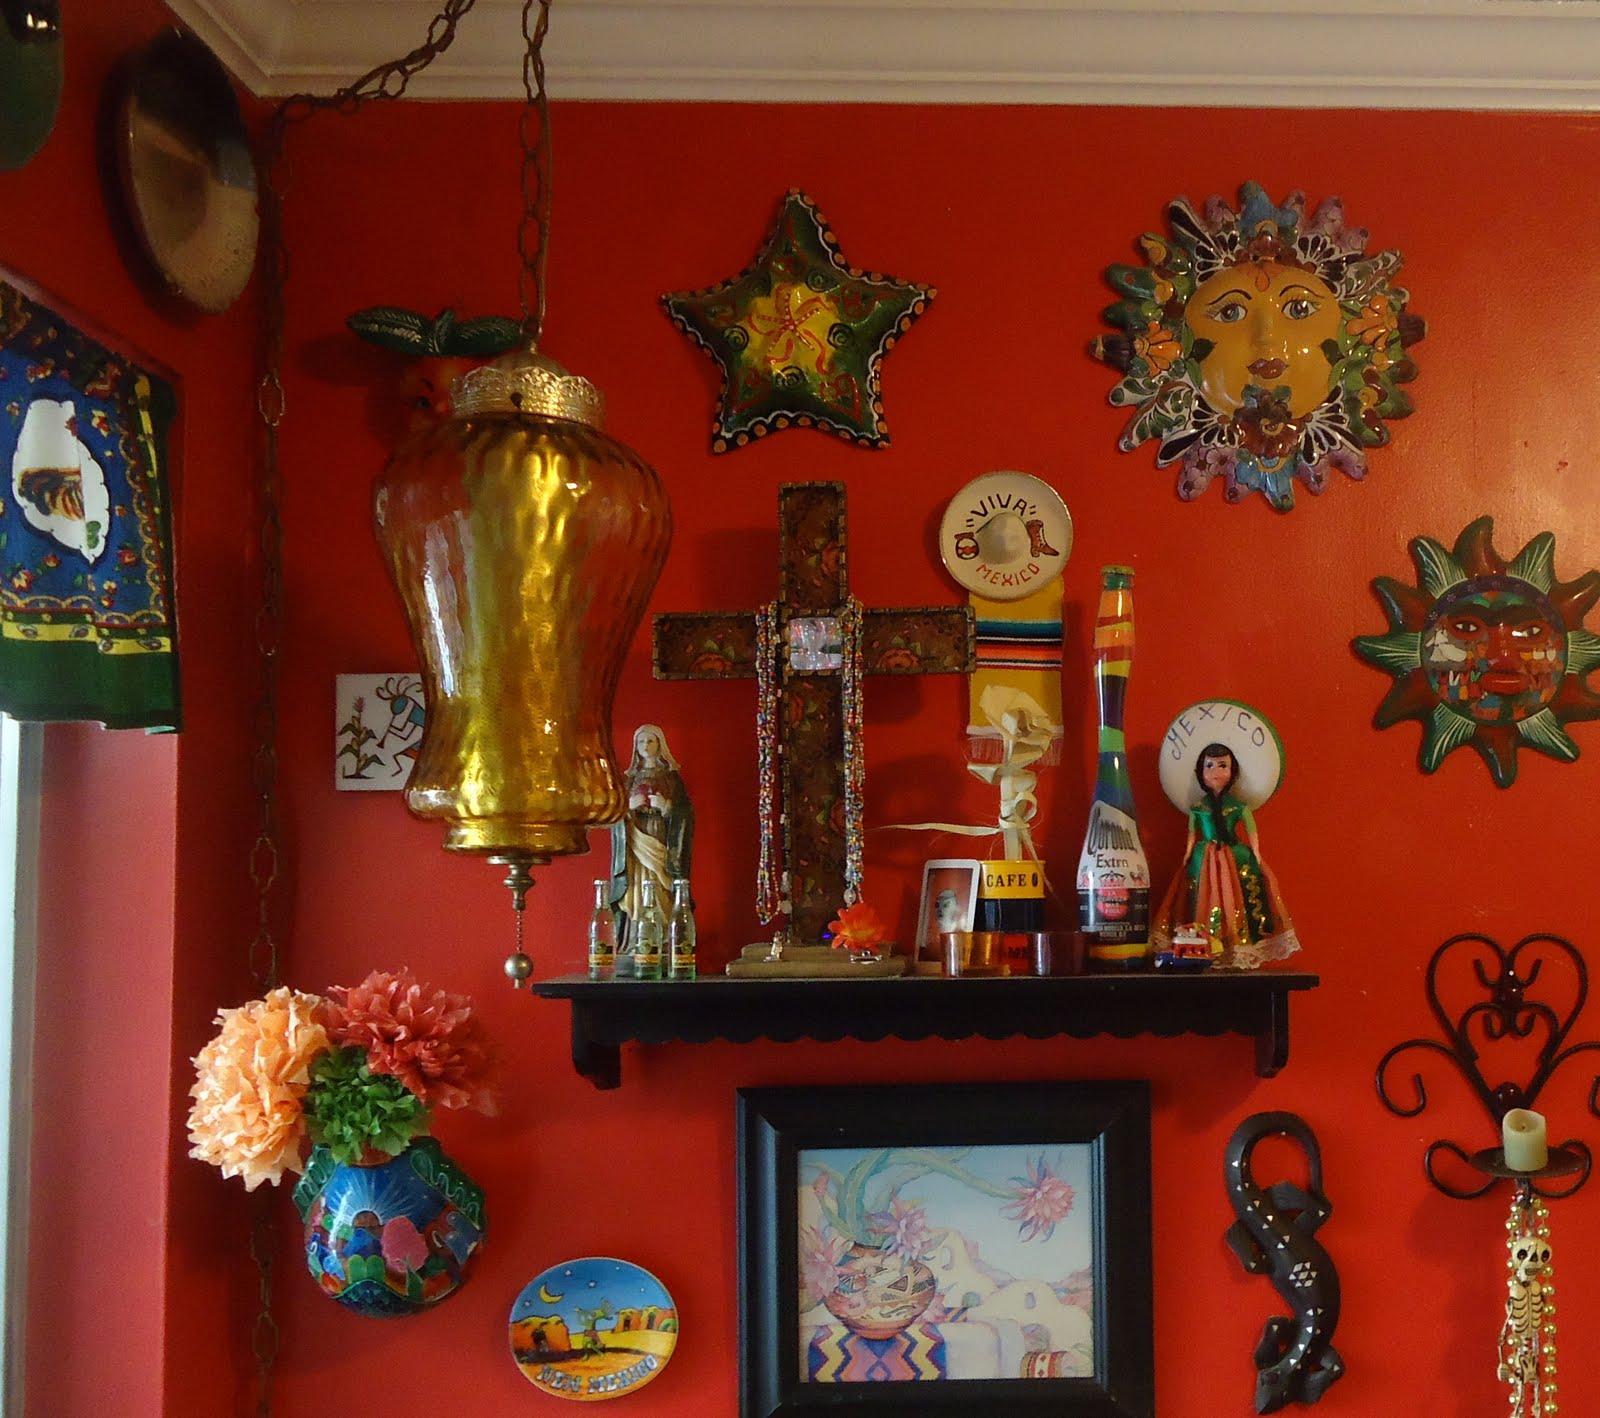 Mexican kitchen Decor | Home Design for Dummies | Pinterest